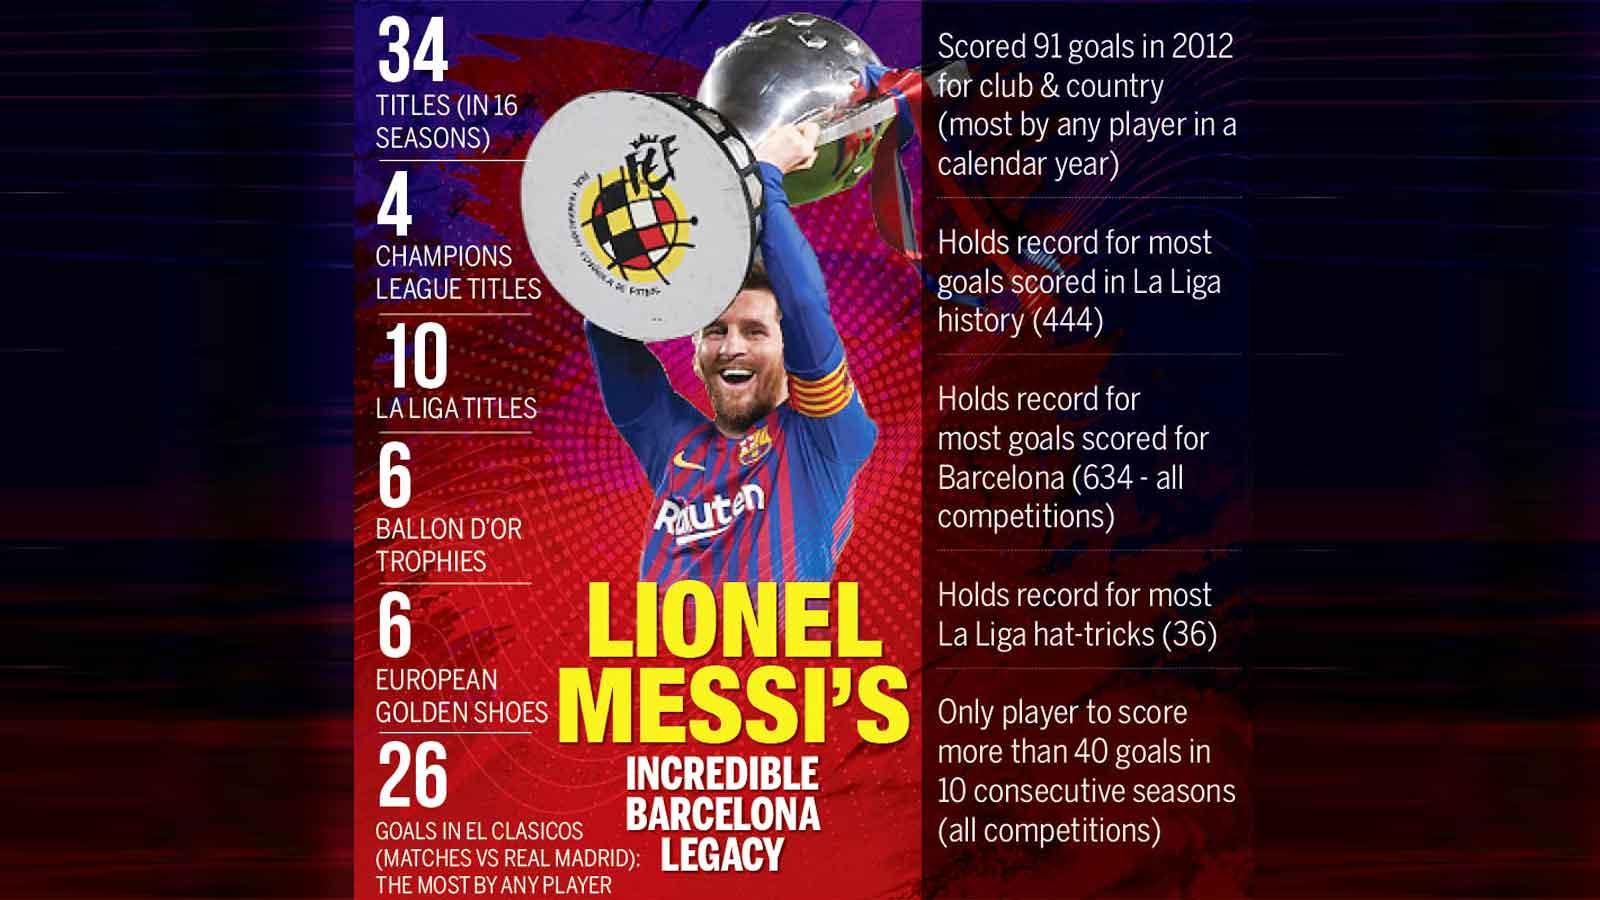 messi-saga-bid-to-oust-barcelona-chief-gathers-pace